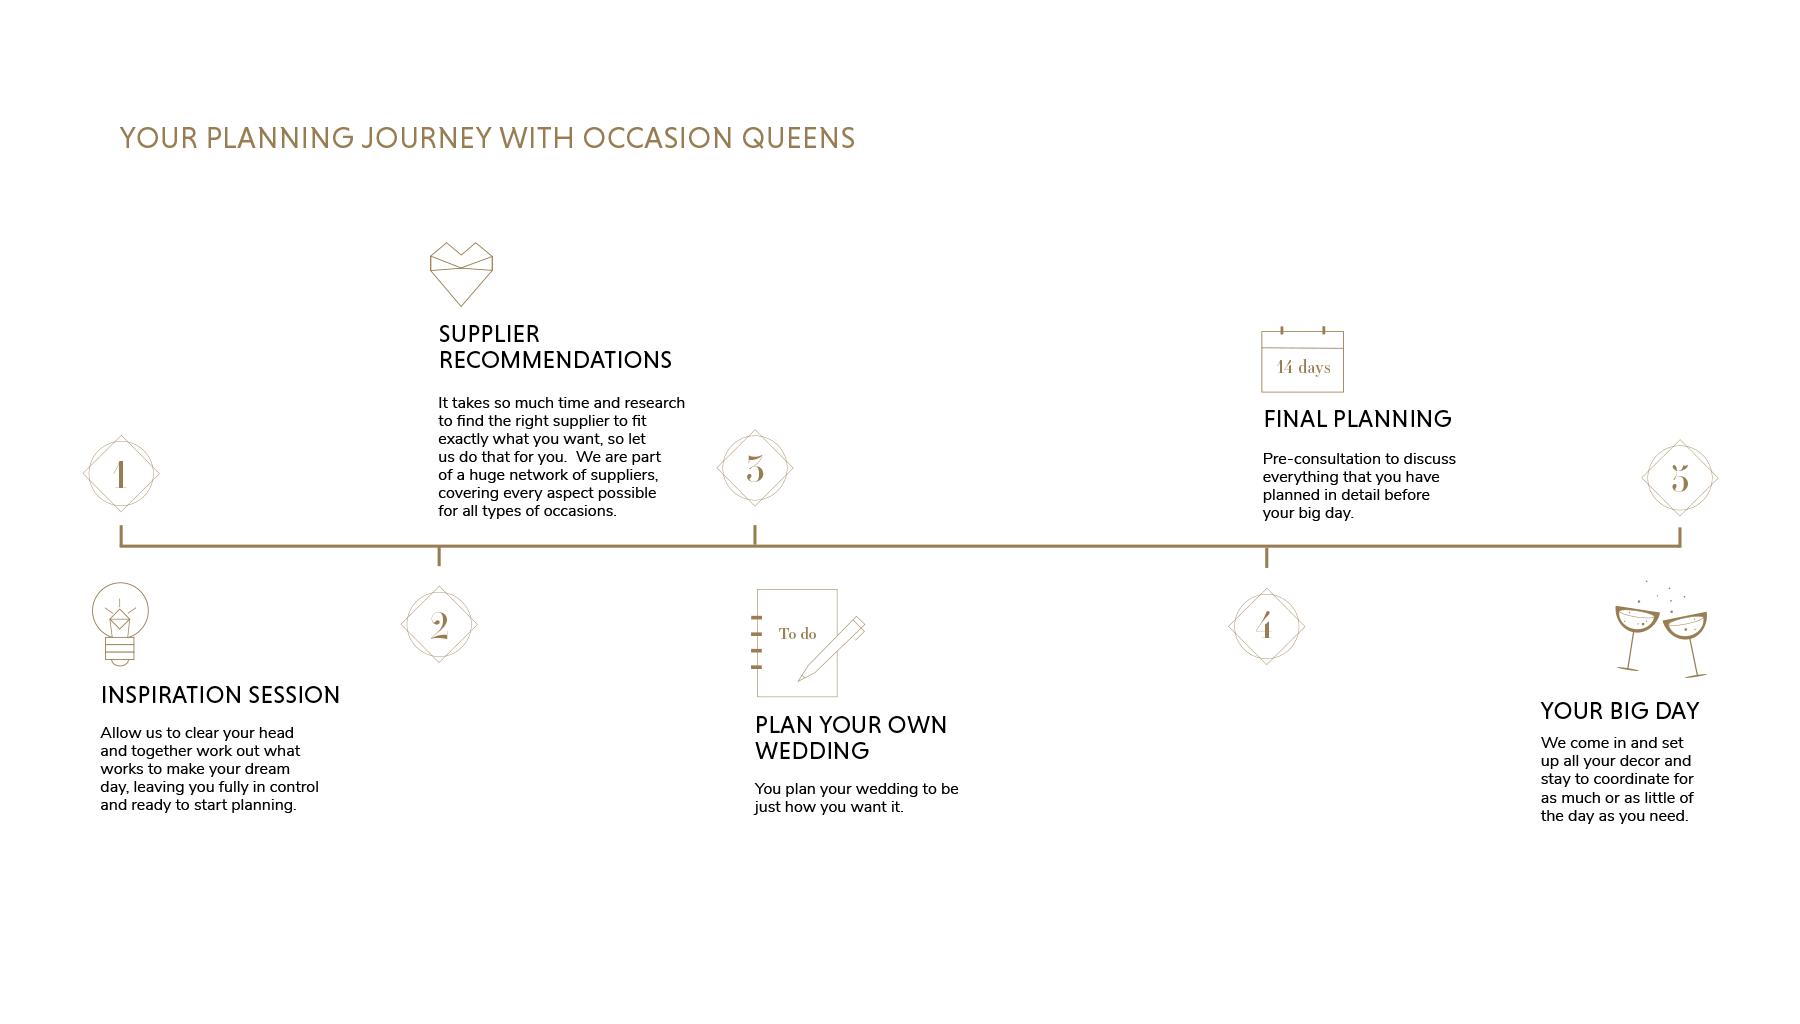 OQ-Customer-Journey-Web-1800-x-1024px-Generic.png